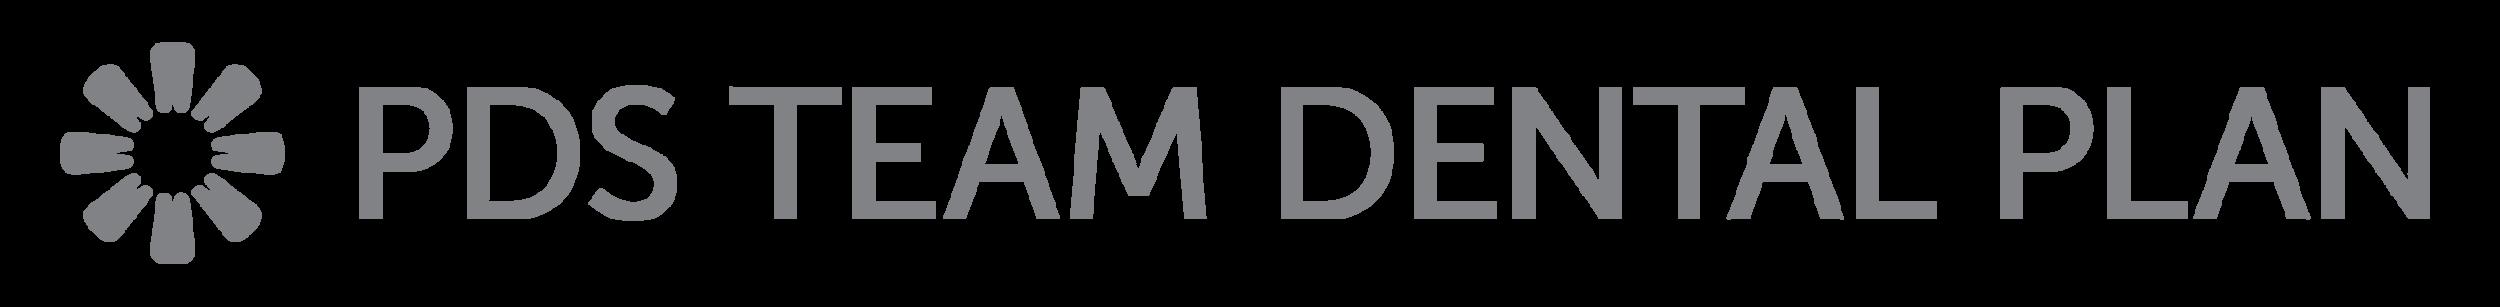 PDS Team Dental Plan Logo_gray.png